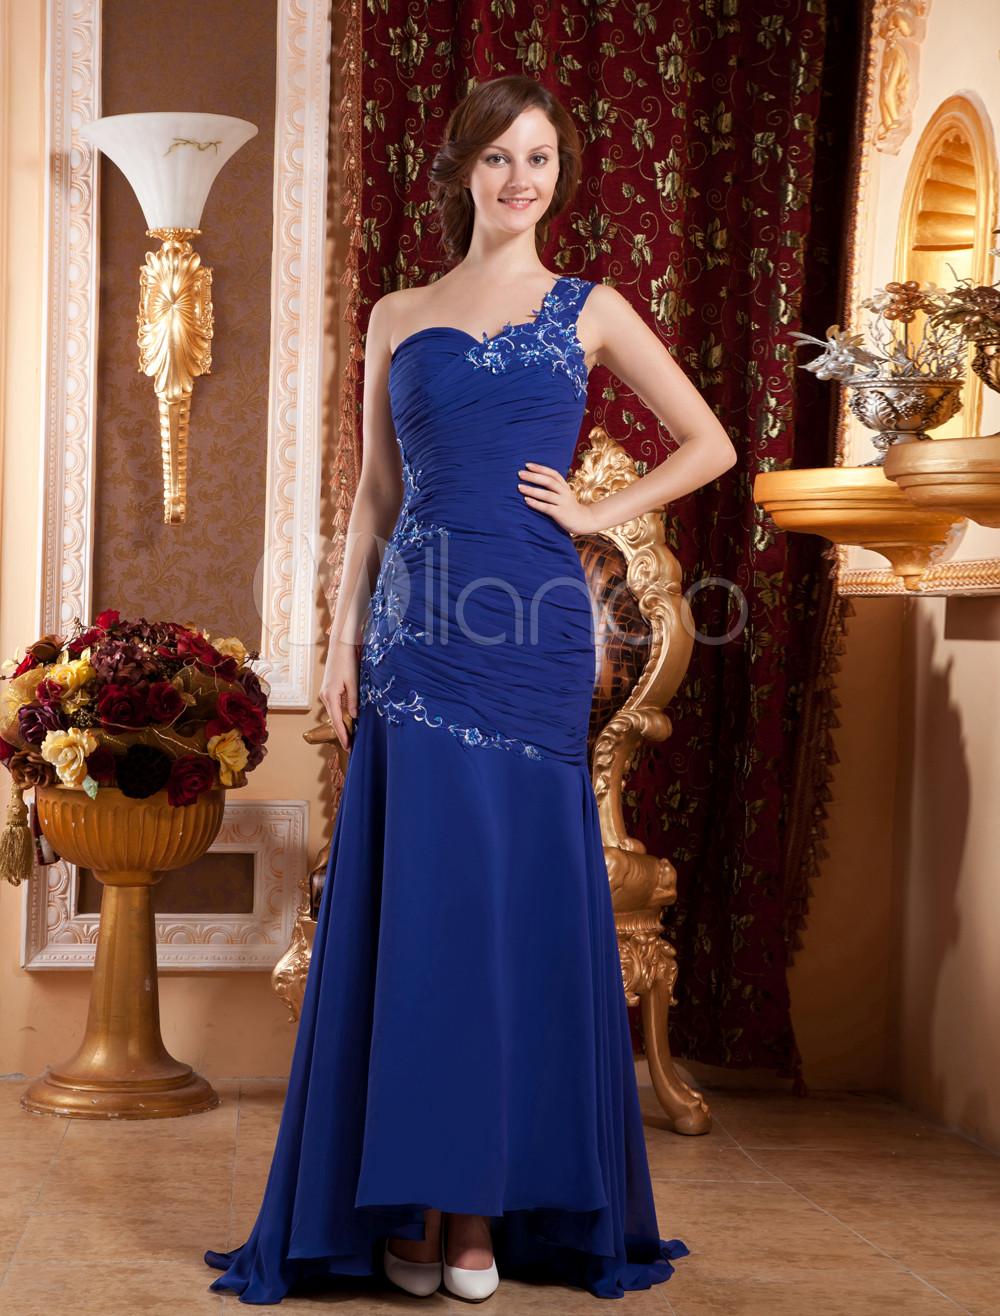 Elegant Royal Blue Chiffon One Shoulder A-line Prom Dress